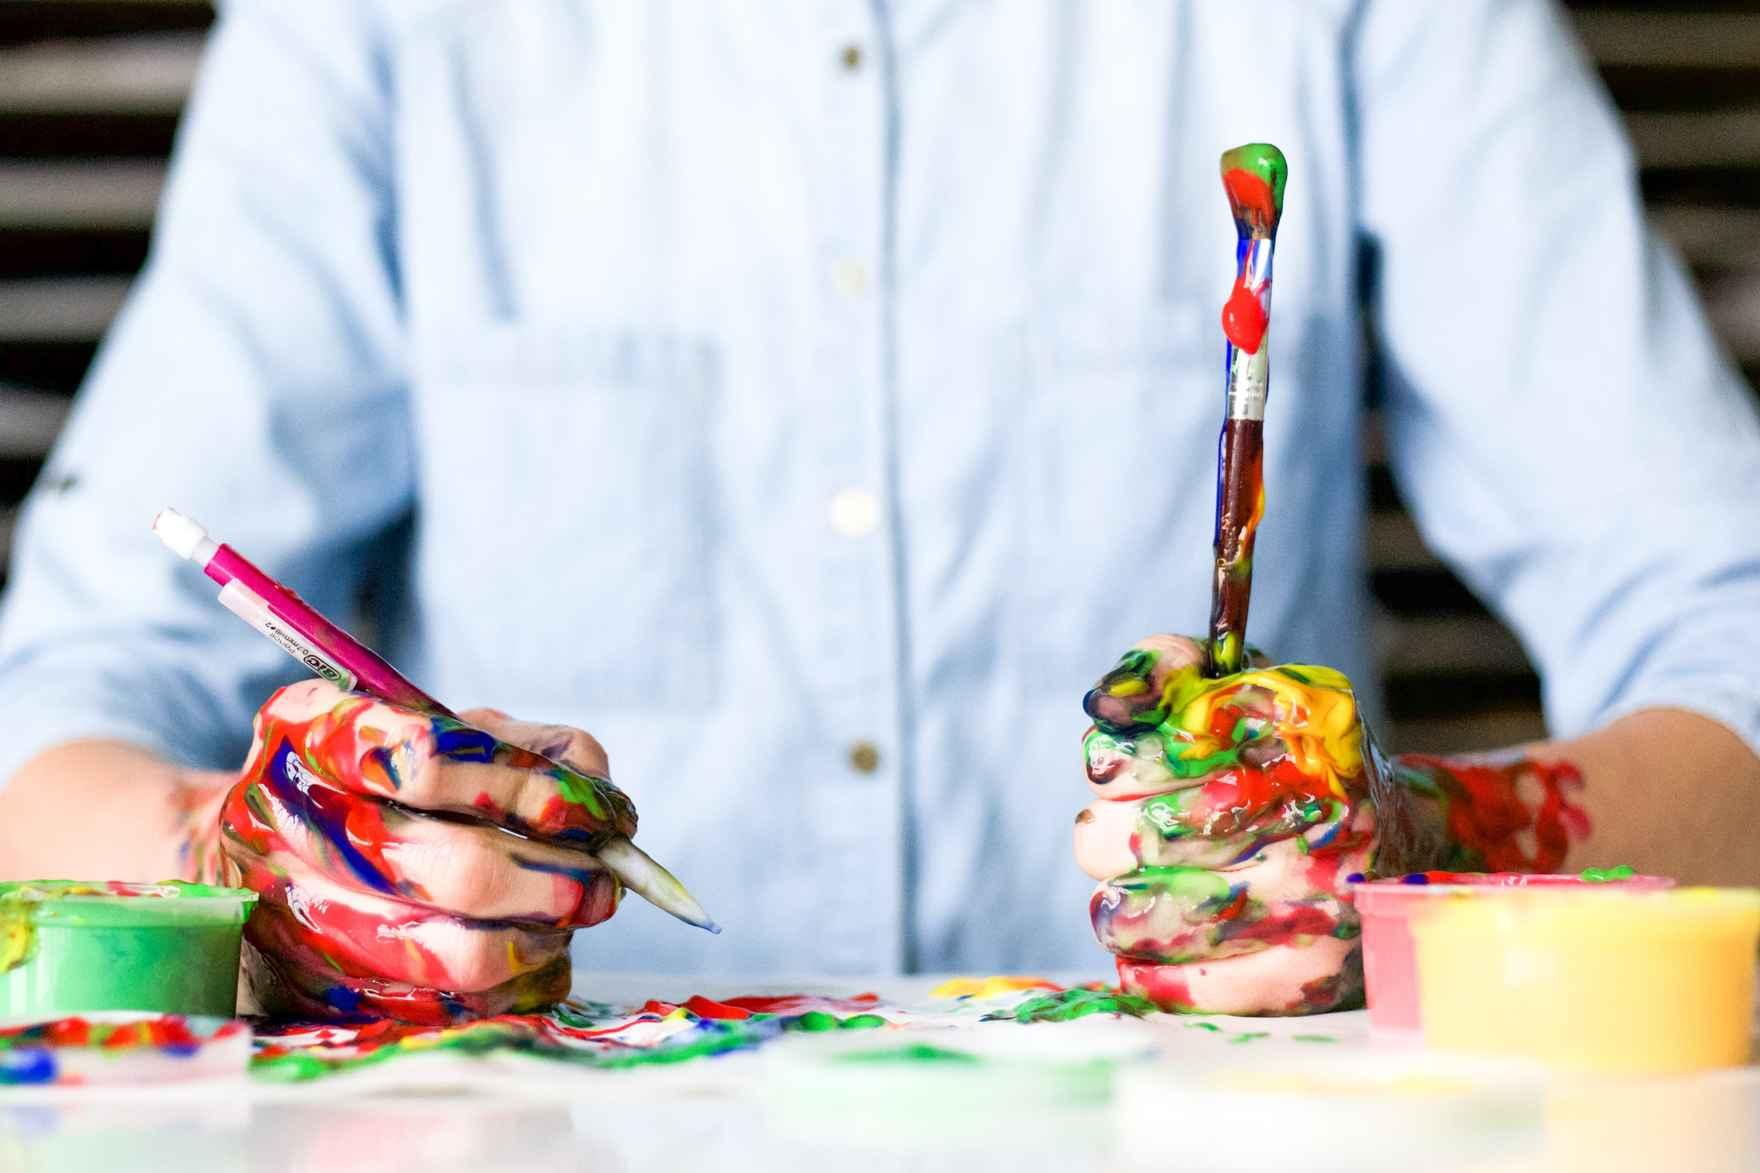 CreativityPaintbrush